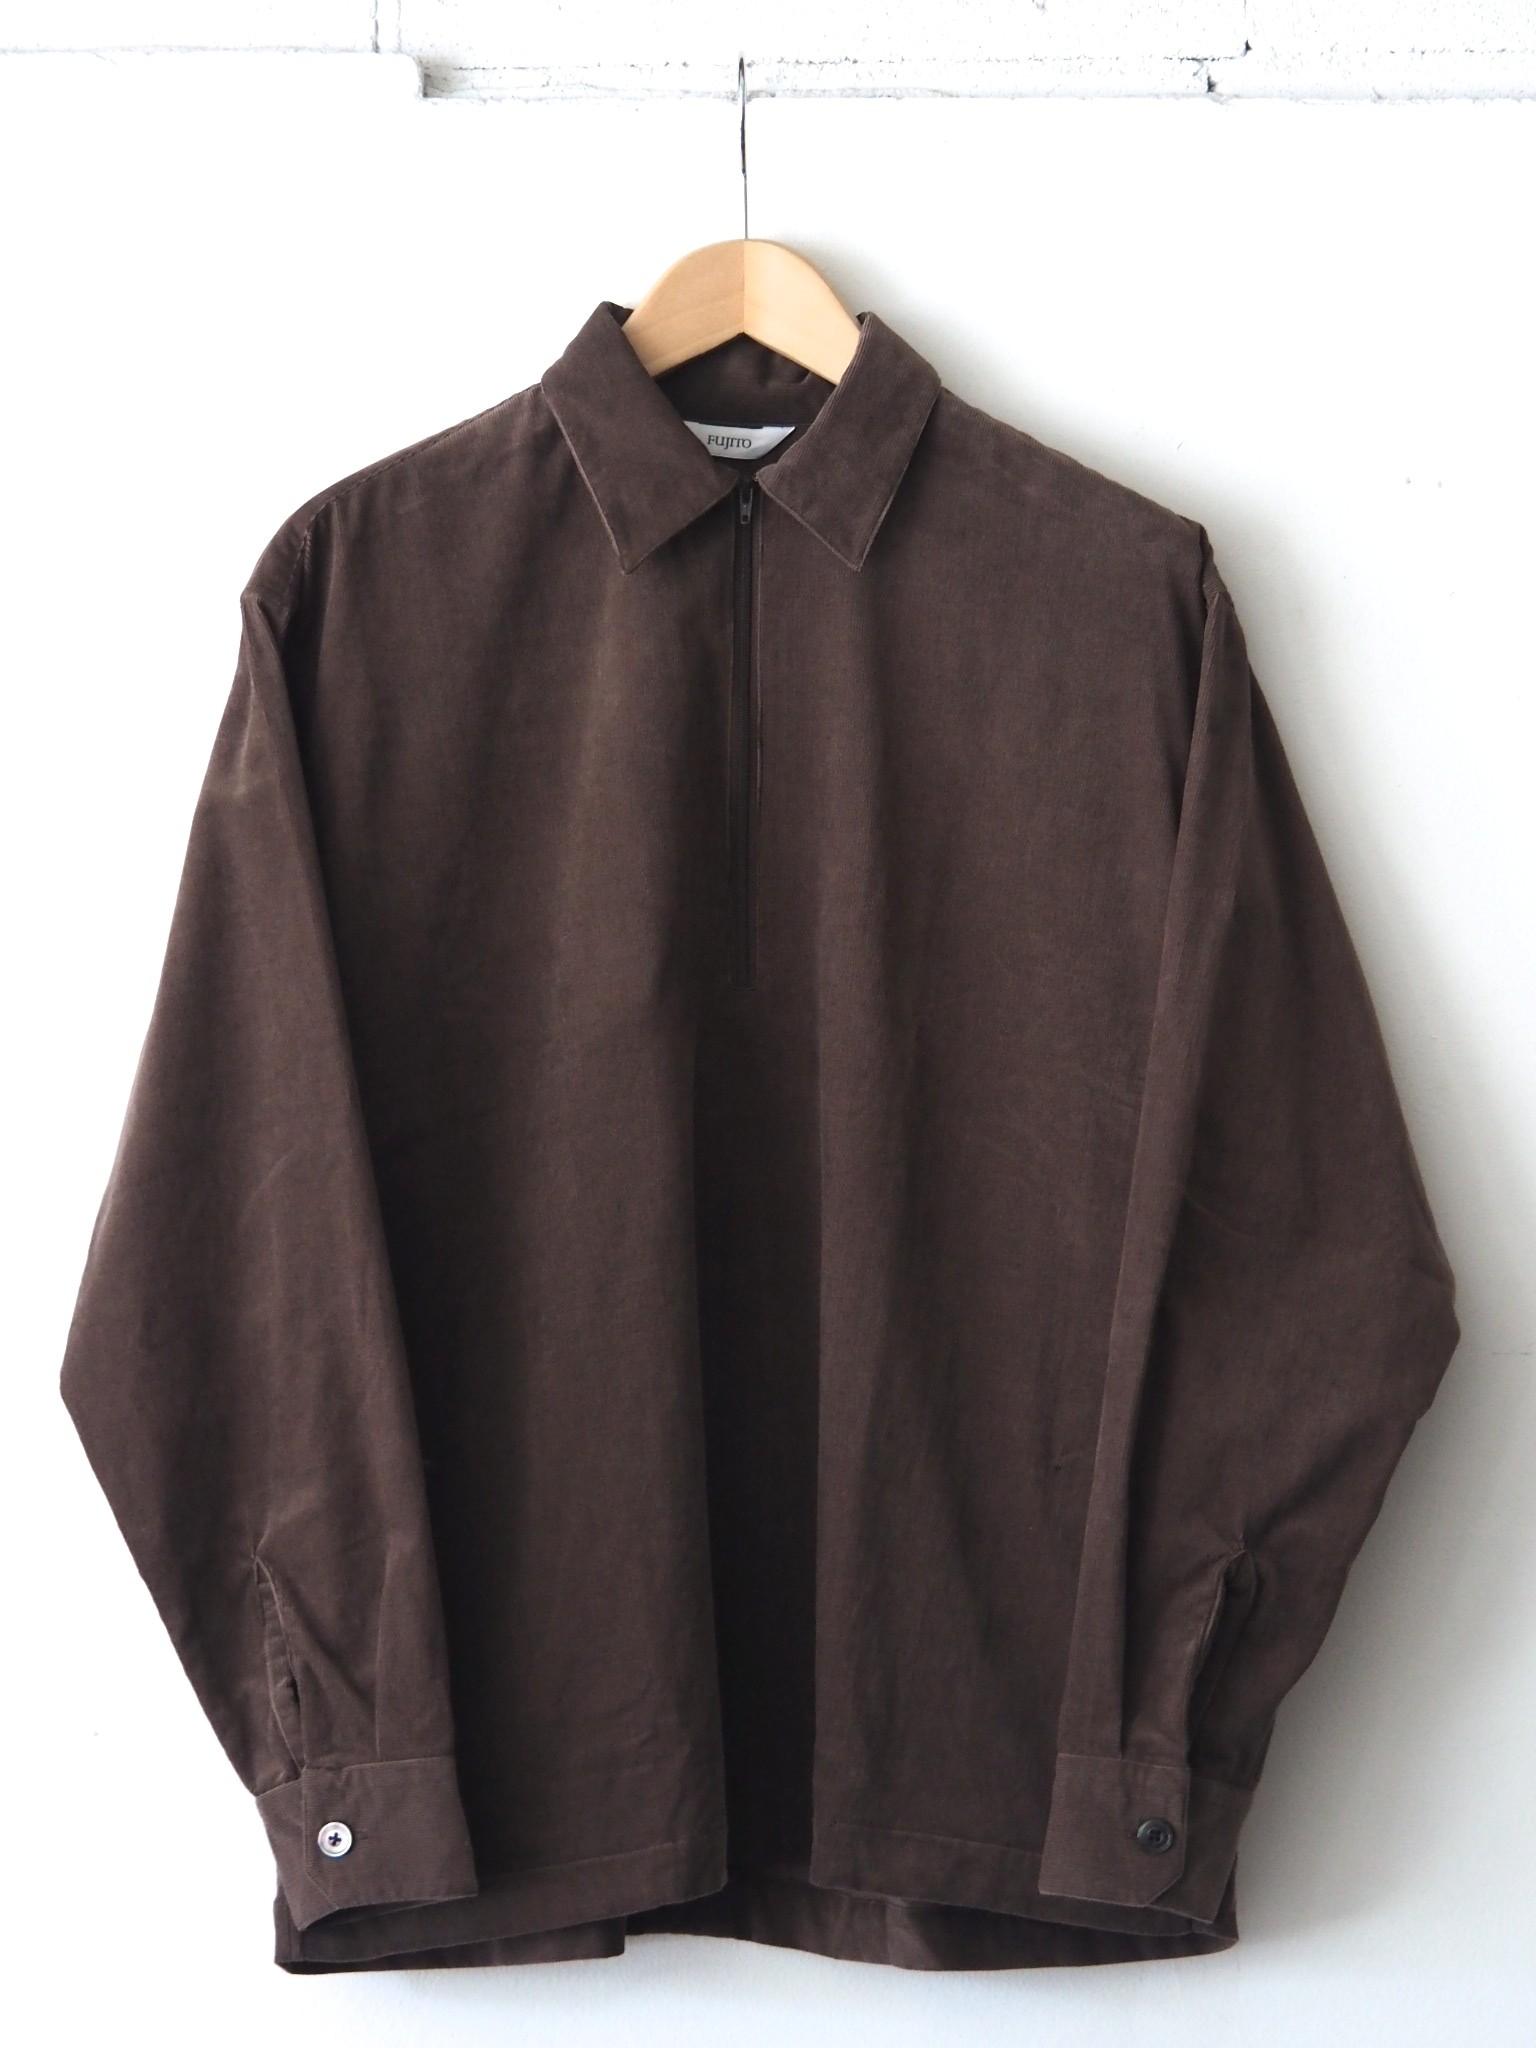 FUJITO Half Zip Shirtのご紹介です